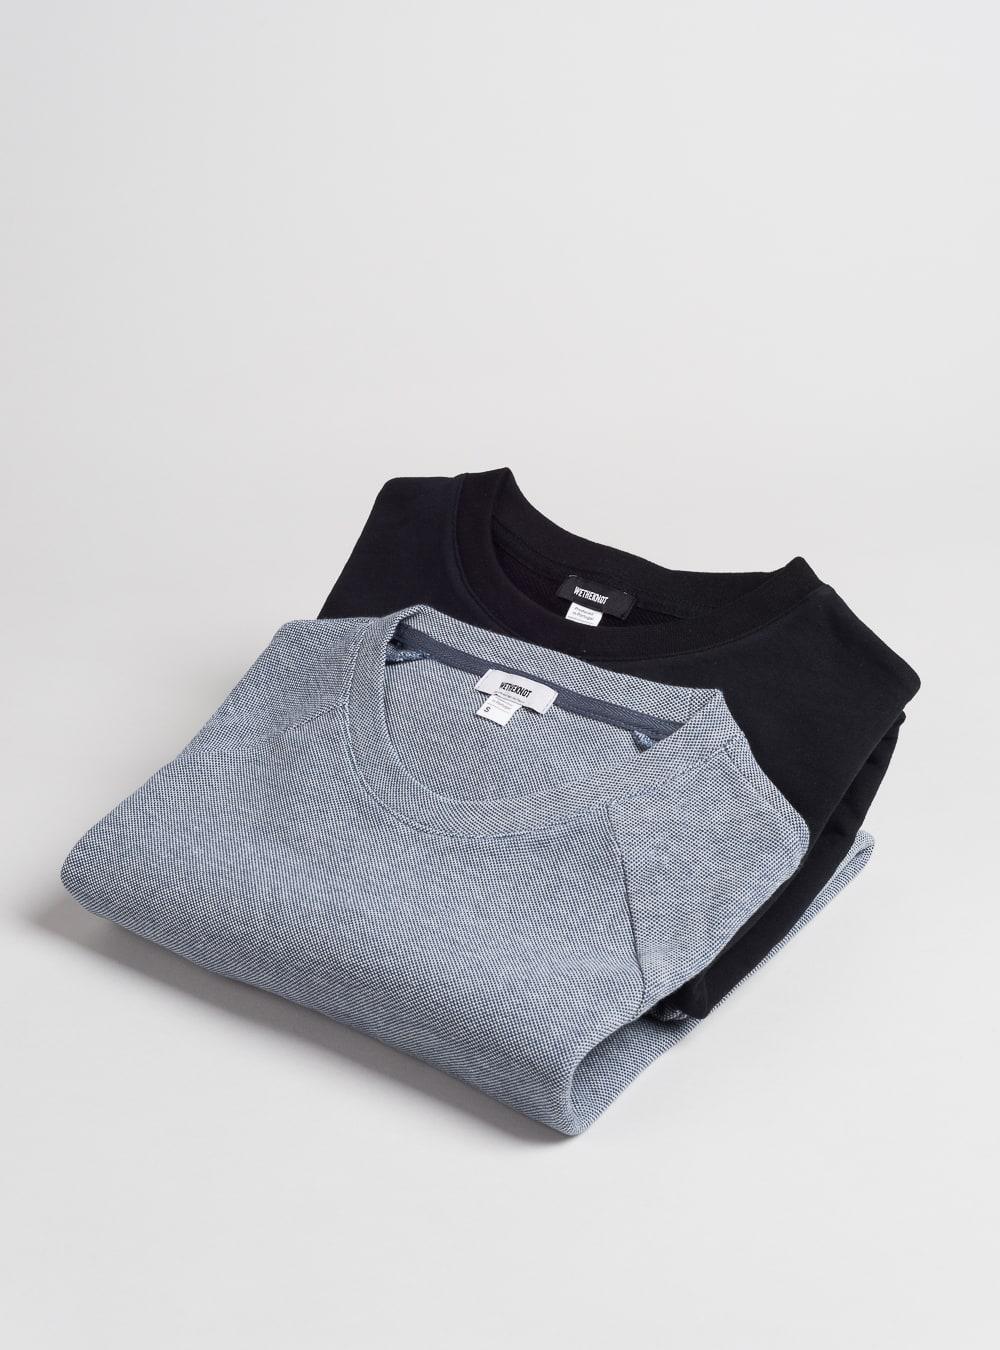 wetheknot essential kits - pack of 2 sweatshirts